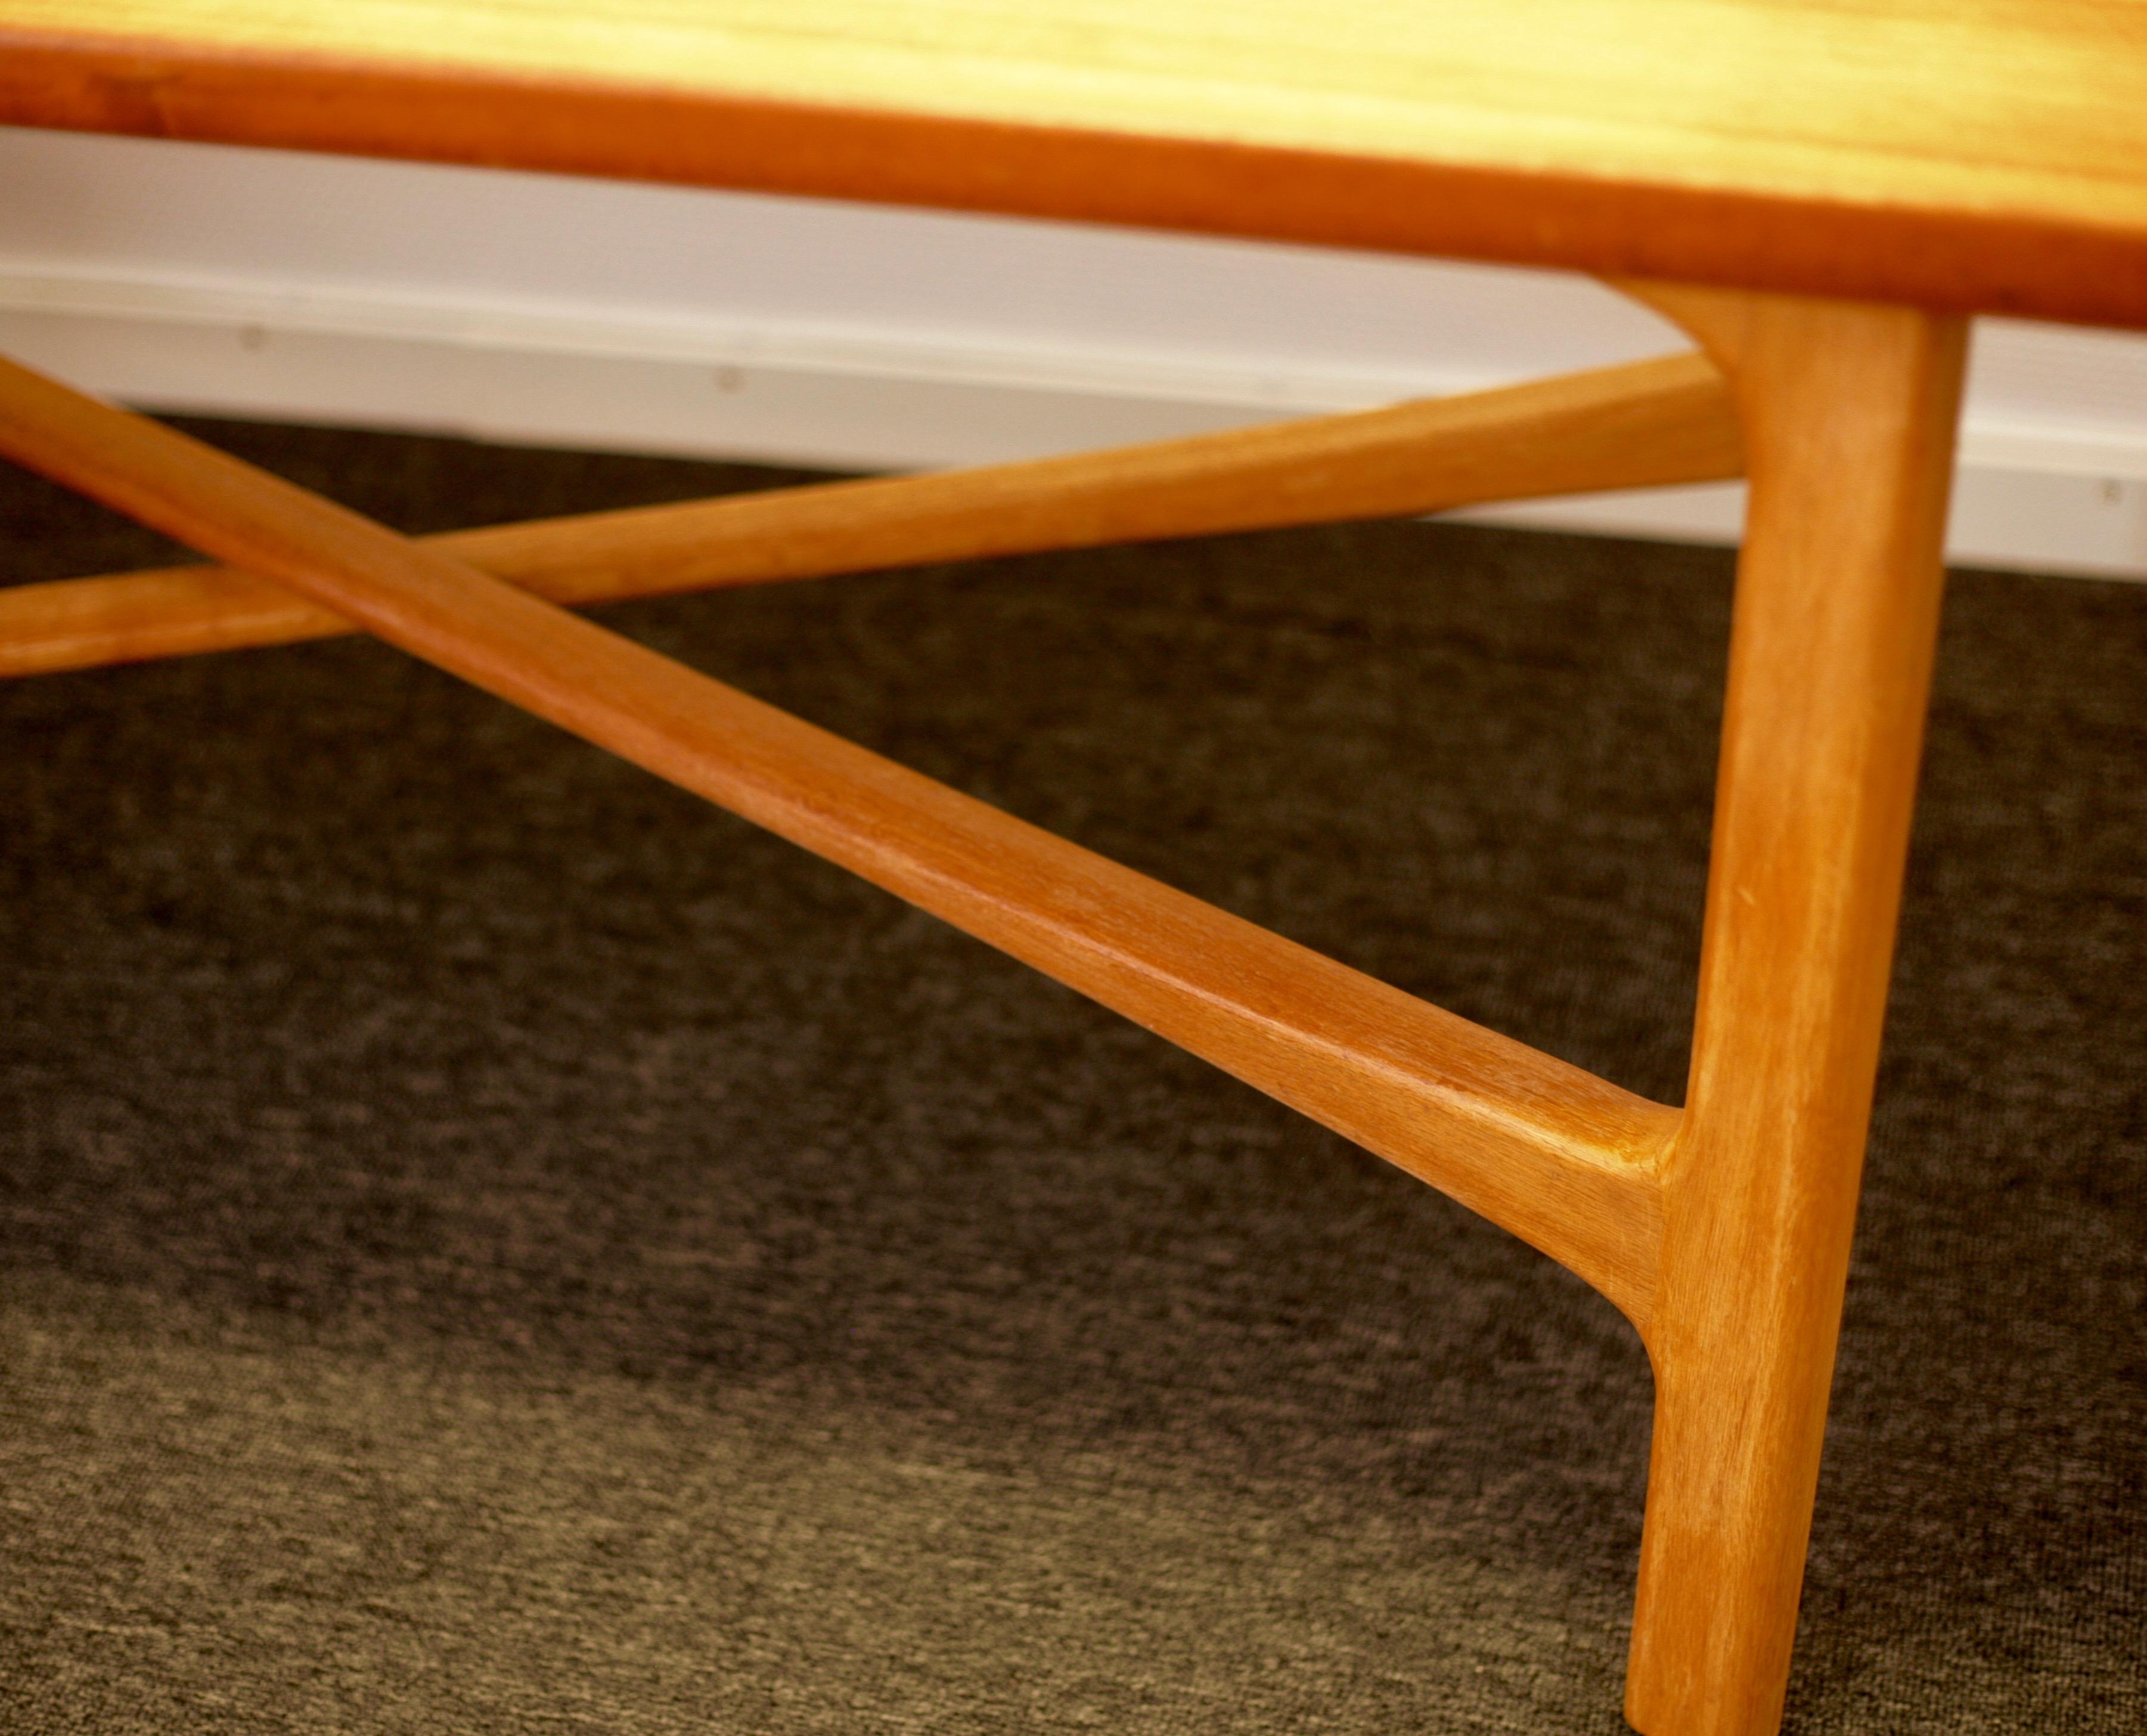 Teak and oak coffee table 'Carmel' by Folke Ohlsson